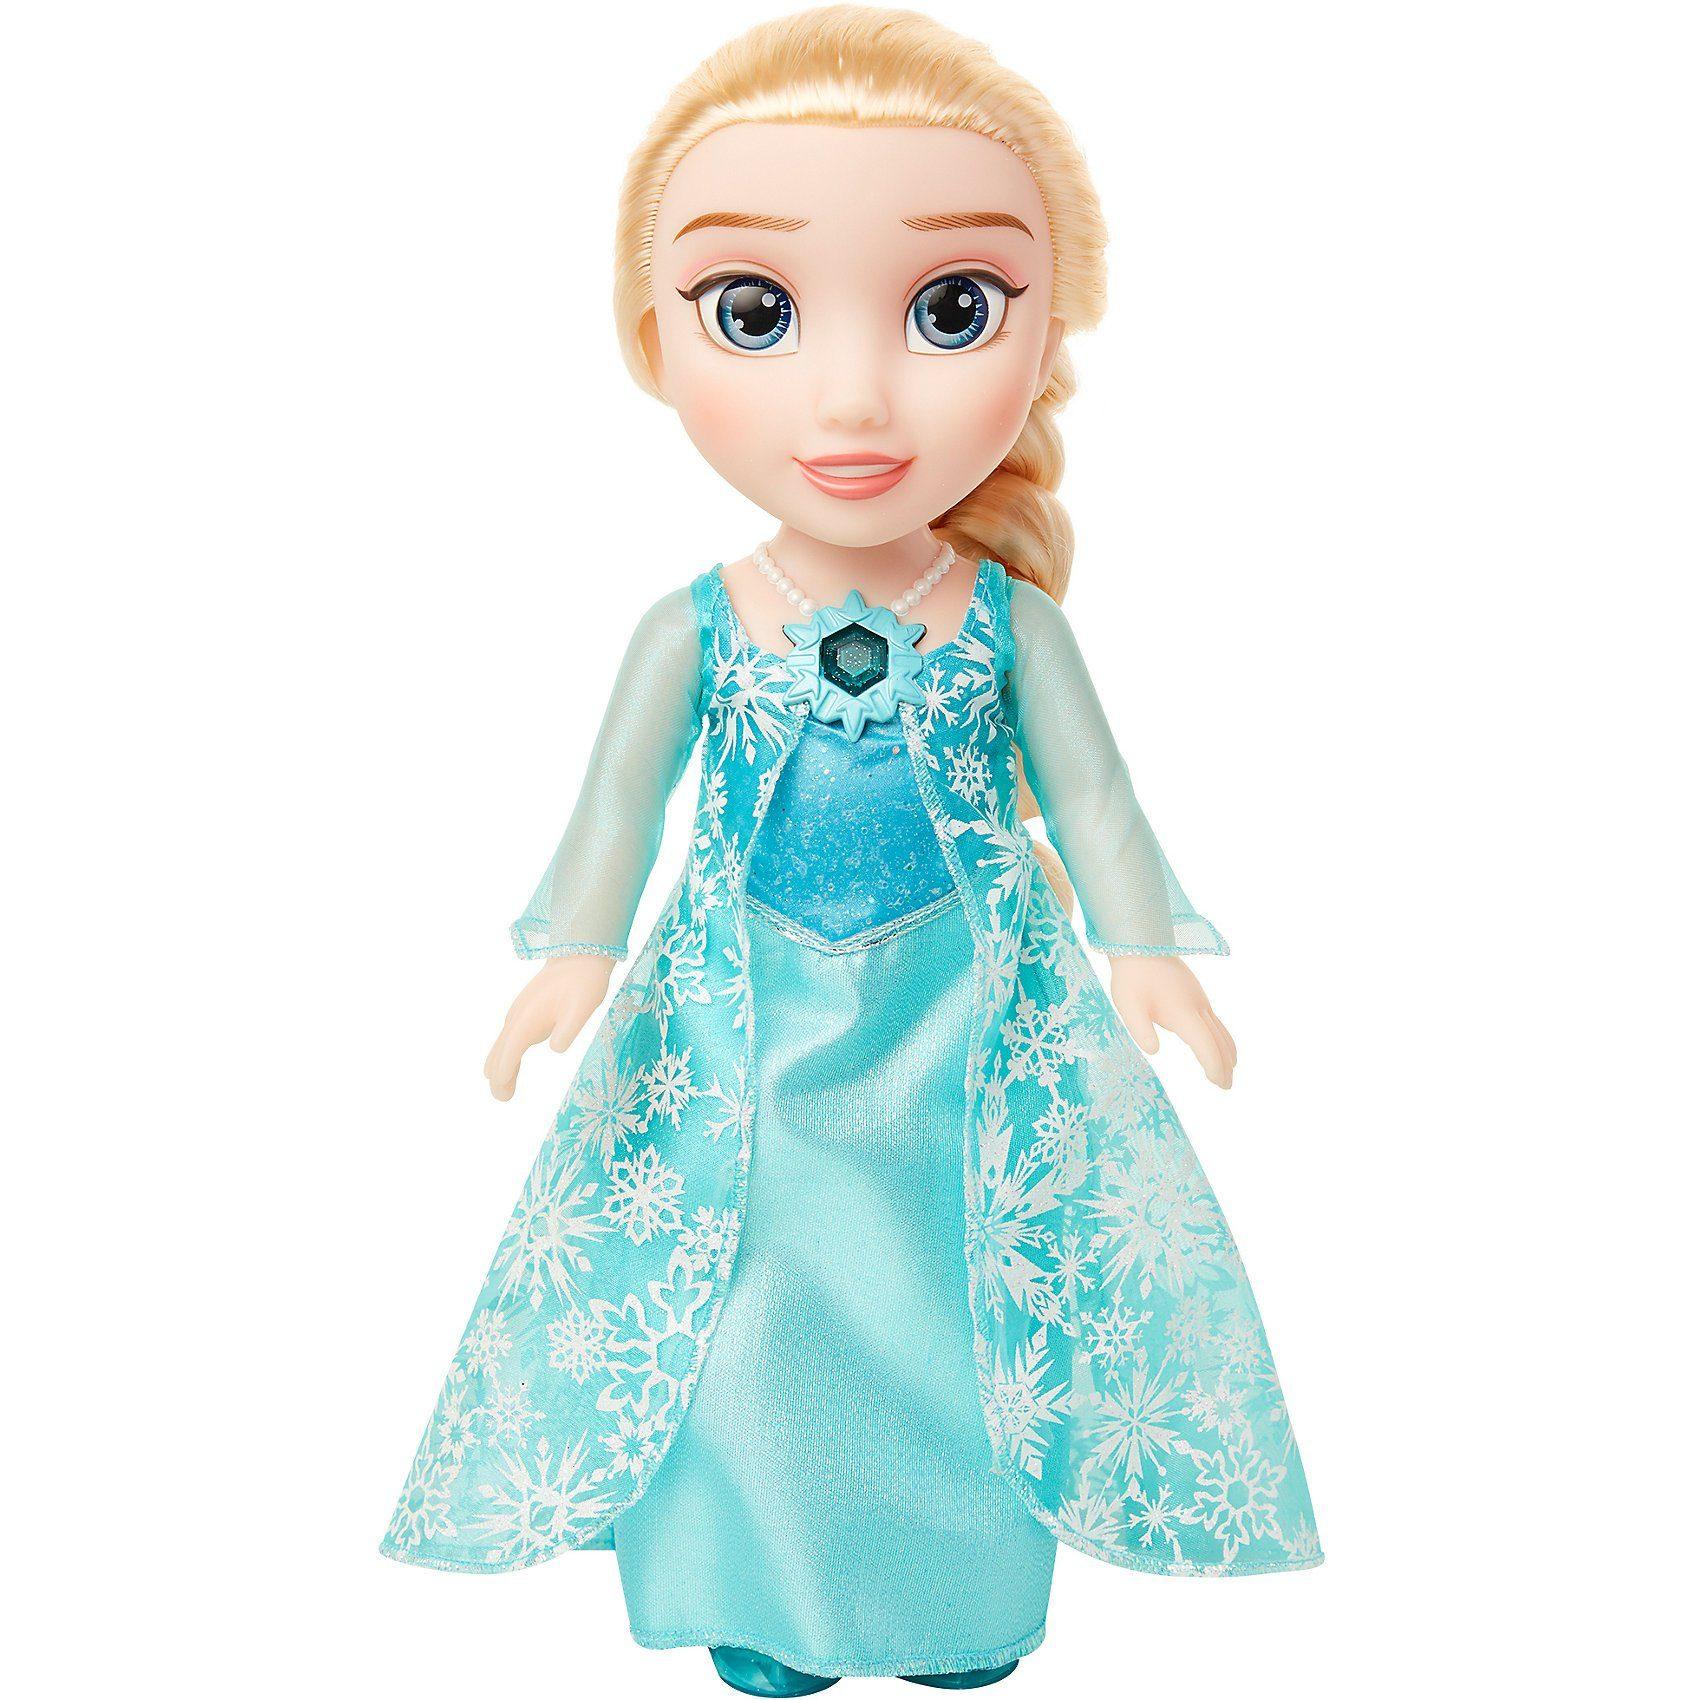 1 x Puppe Prinzessin brünett 28 cm Augen Grün Doll Princess Winter Dreams Puppen